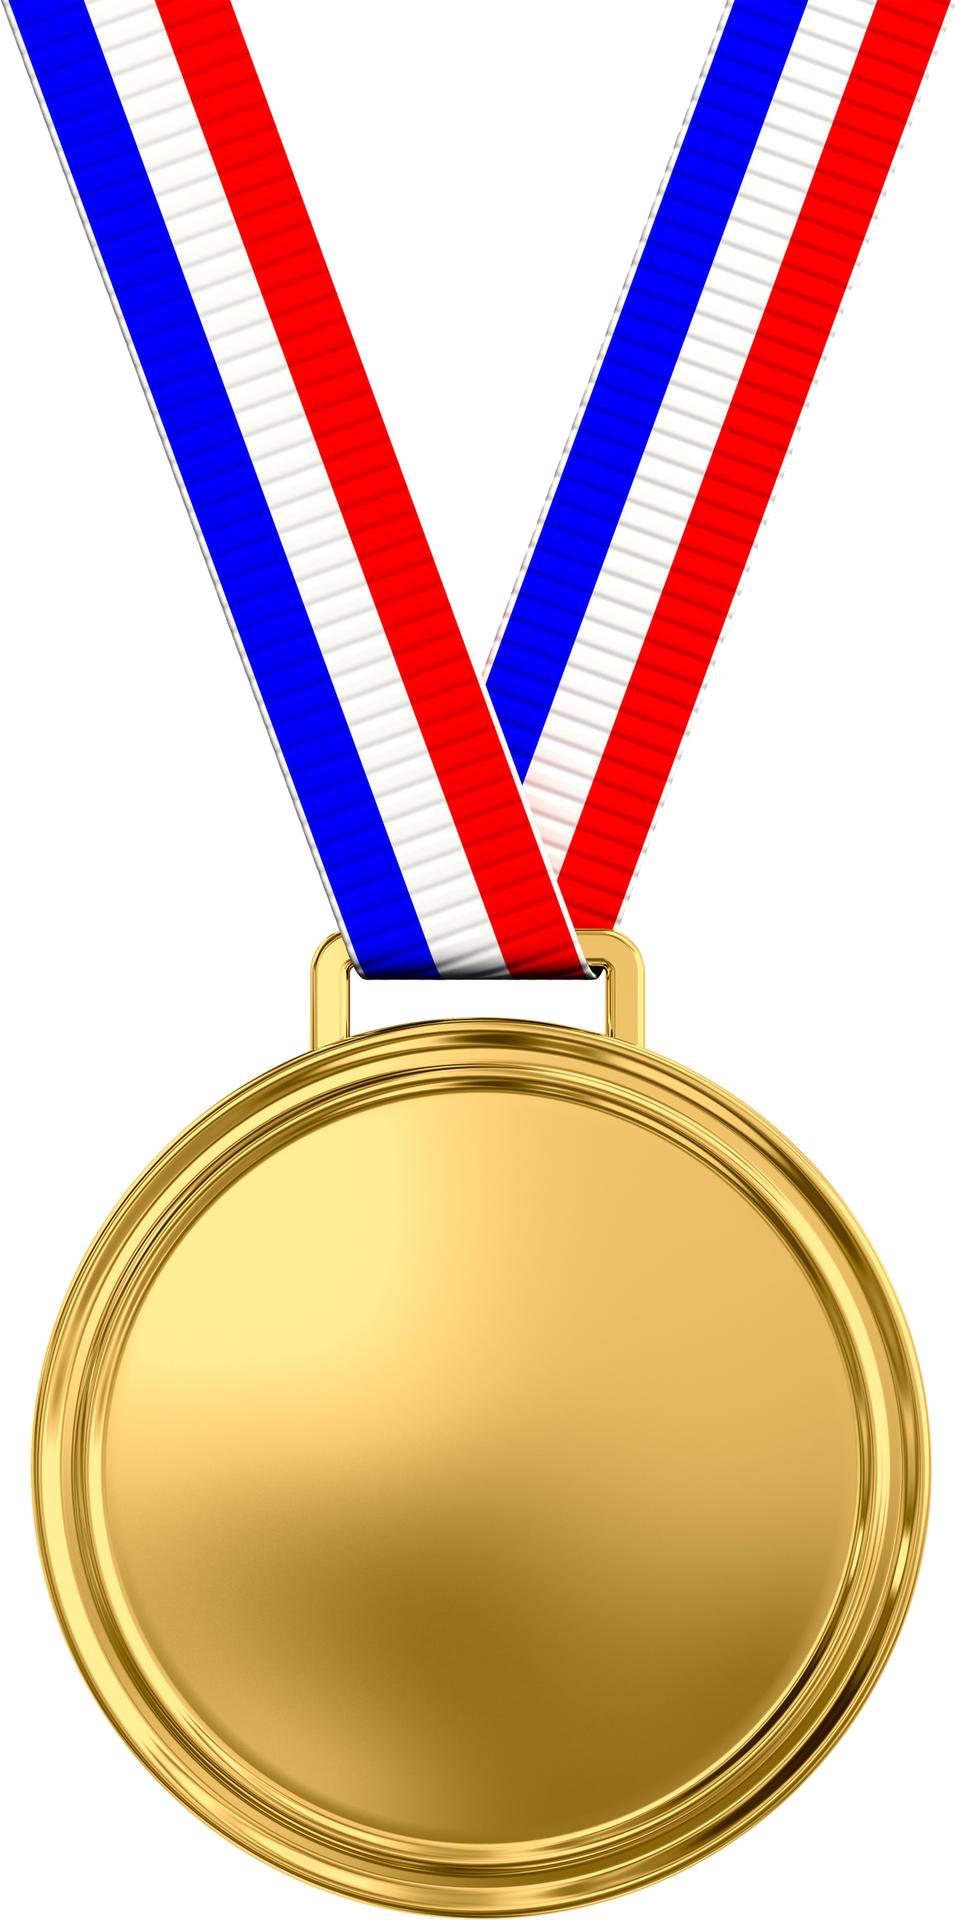 Gold Medal PNG Image - PurePNG   Free transparent CC0 PNG ...